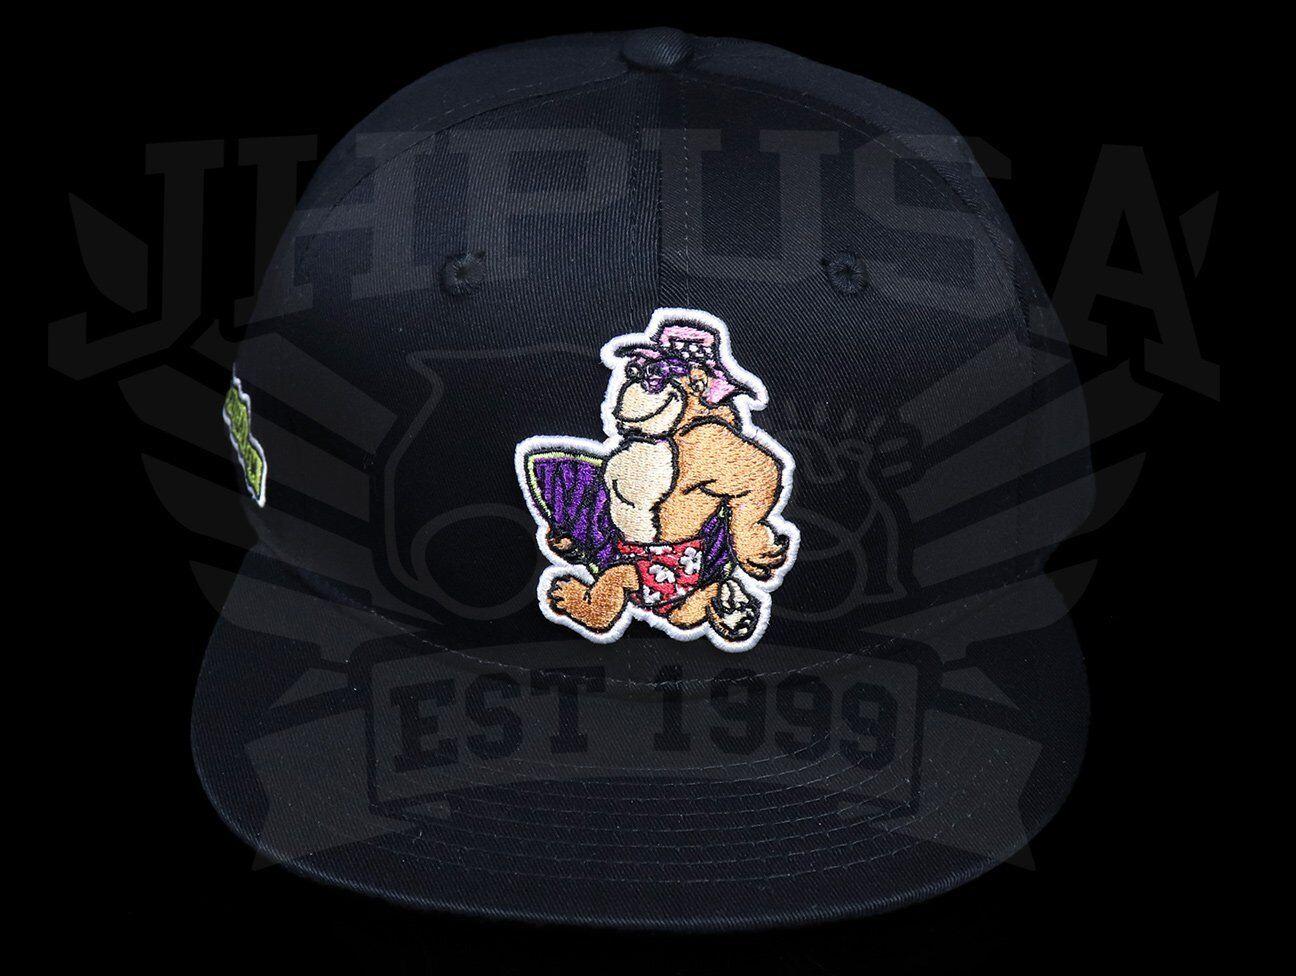 Thrilla Krew TKG Dot Logo Black Snapback Cap